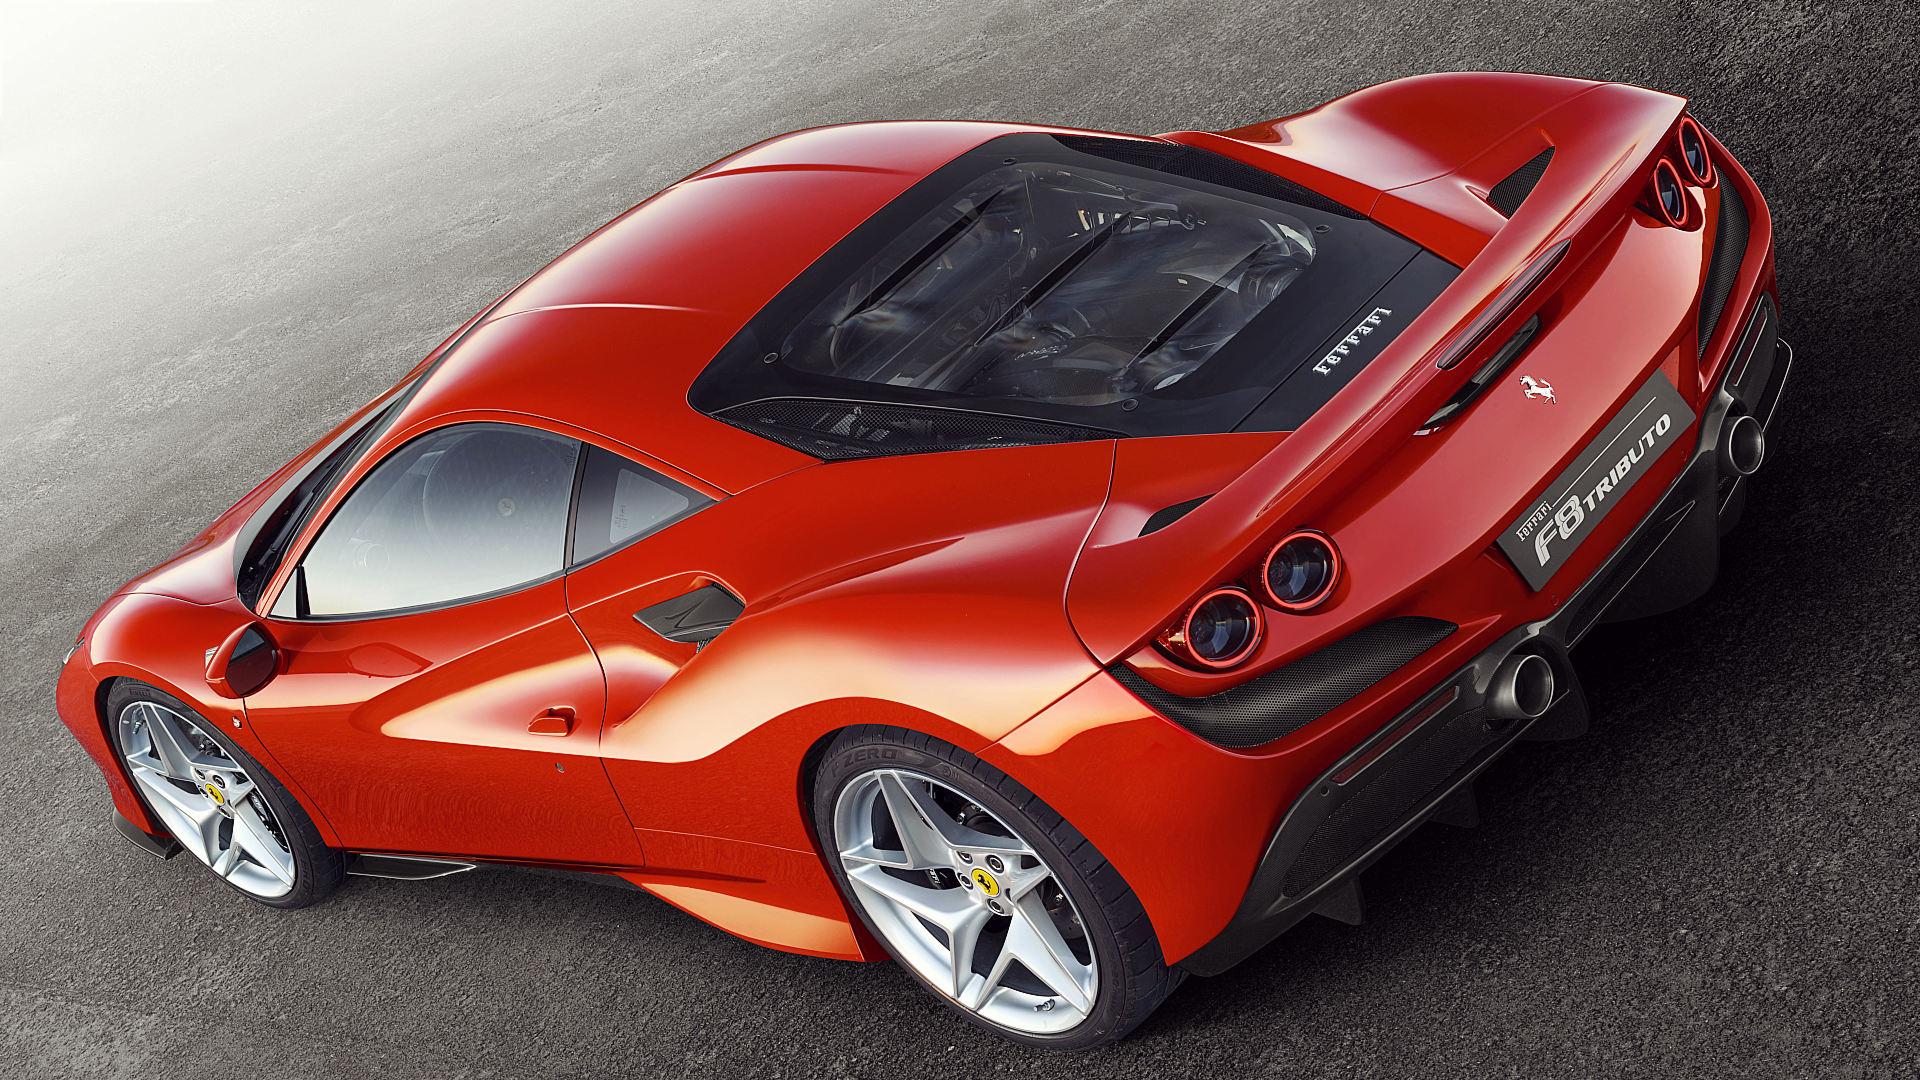 2020 Ferrari F8 Tributo Red Wallpaper Images